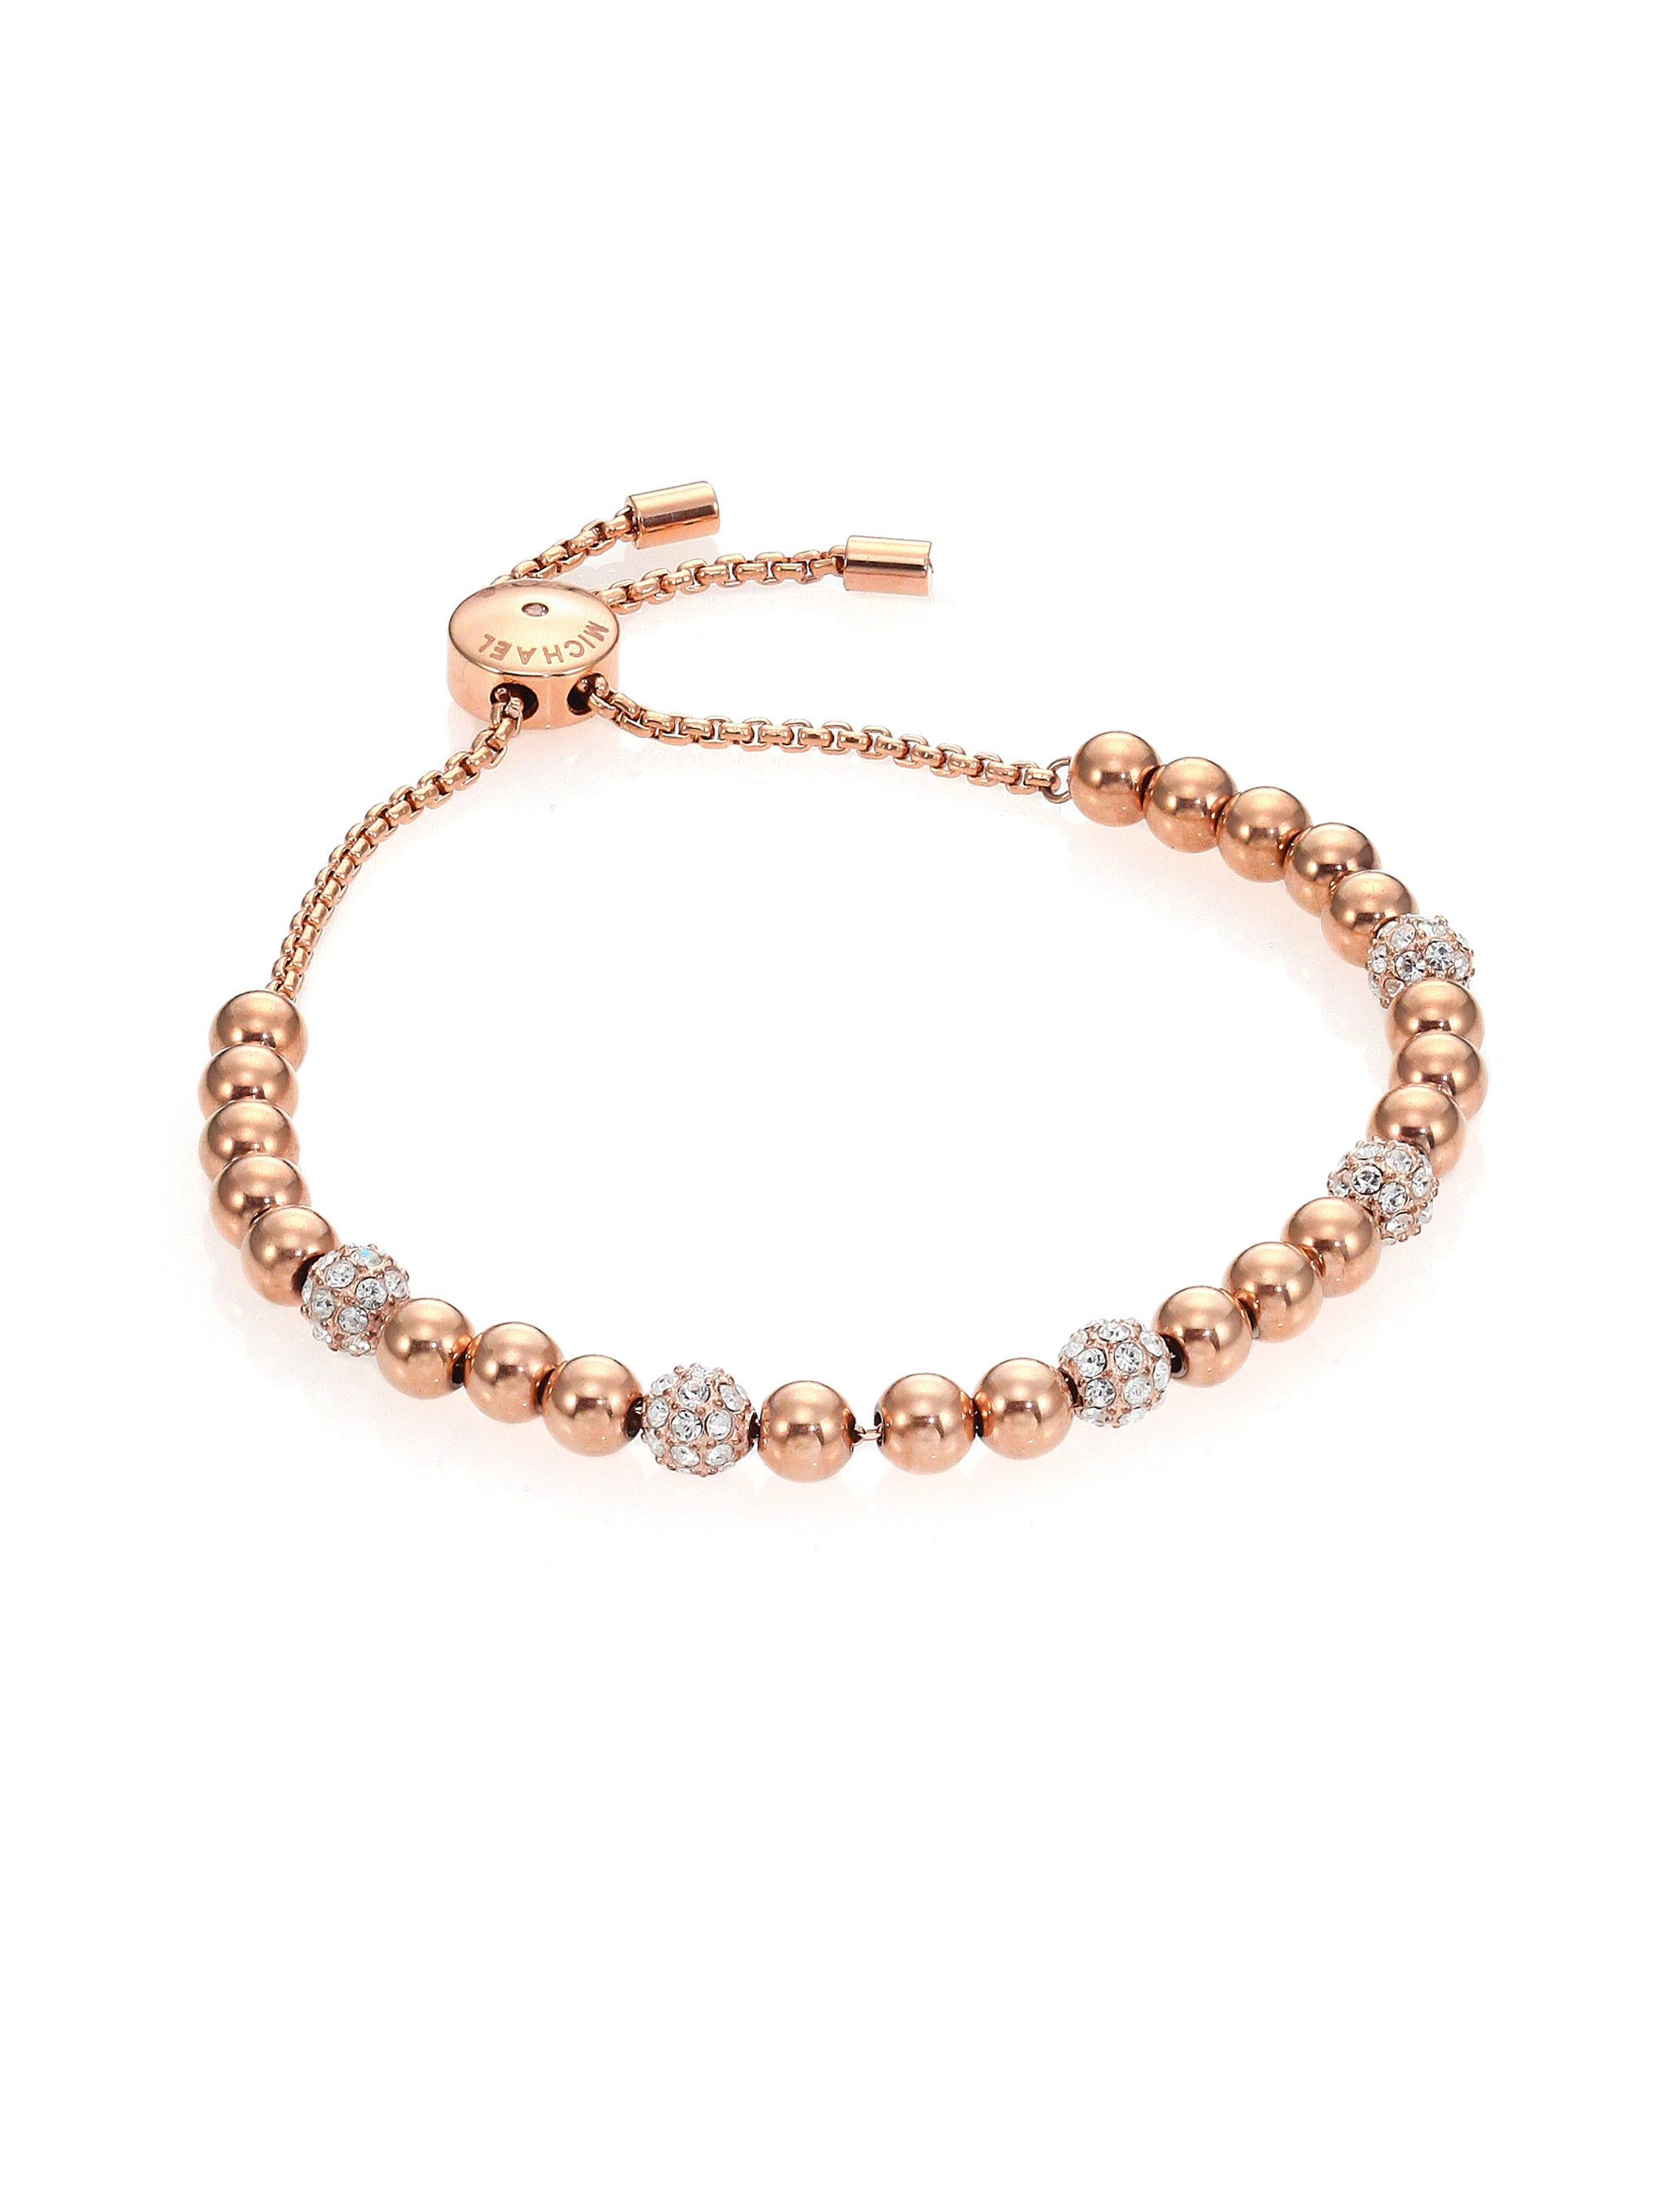 db13a16c93f7 Lyst - Michael Kors Brilliance Pave Beaded Slide Bracelet rose ...